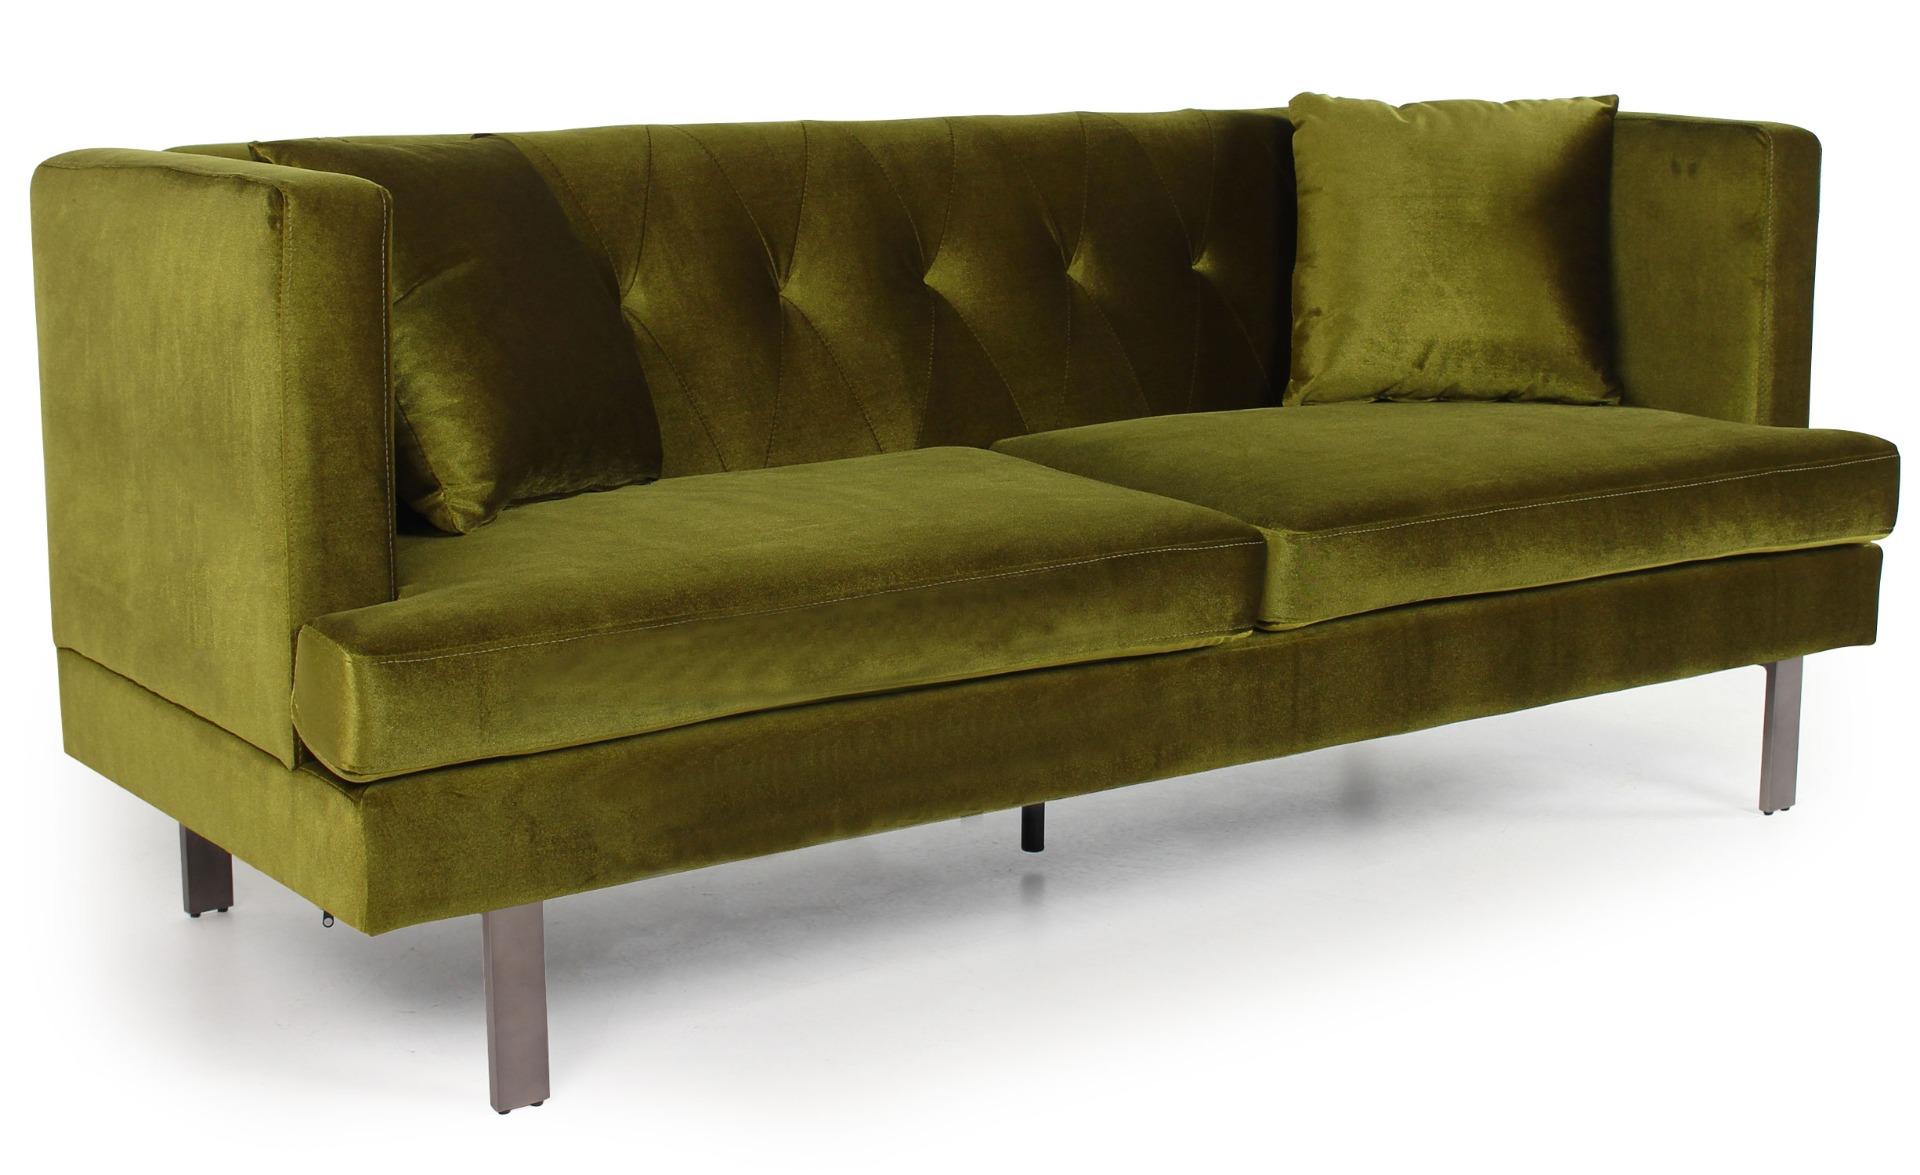 Vincennes 3-Sitzer Sofa mit Samtbezug Khaki